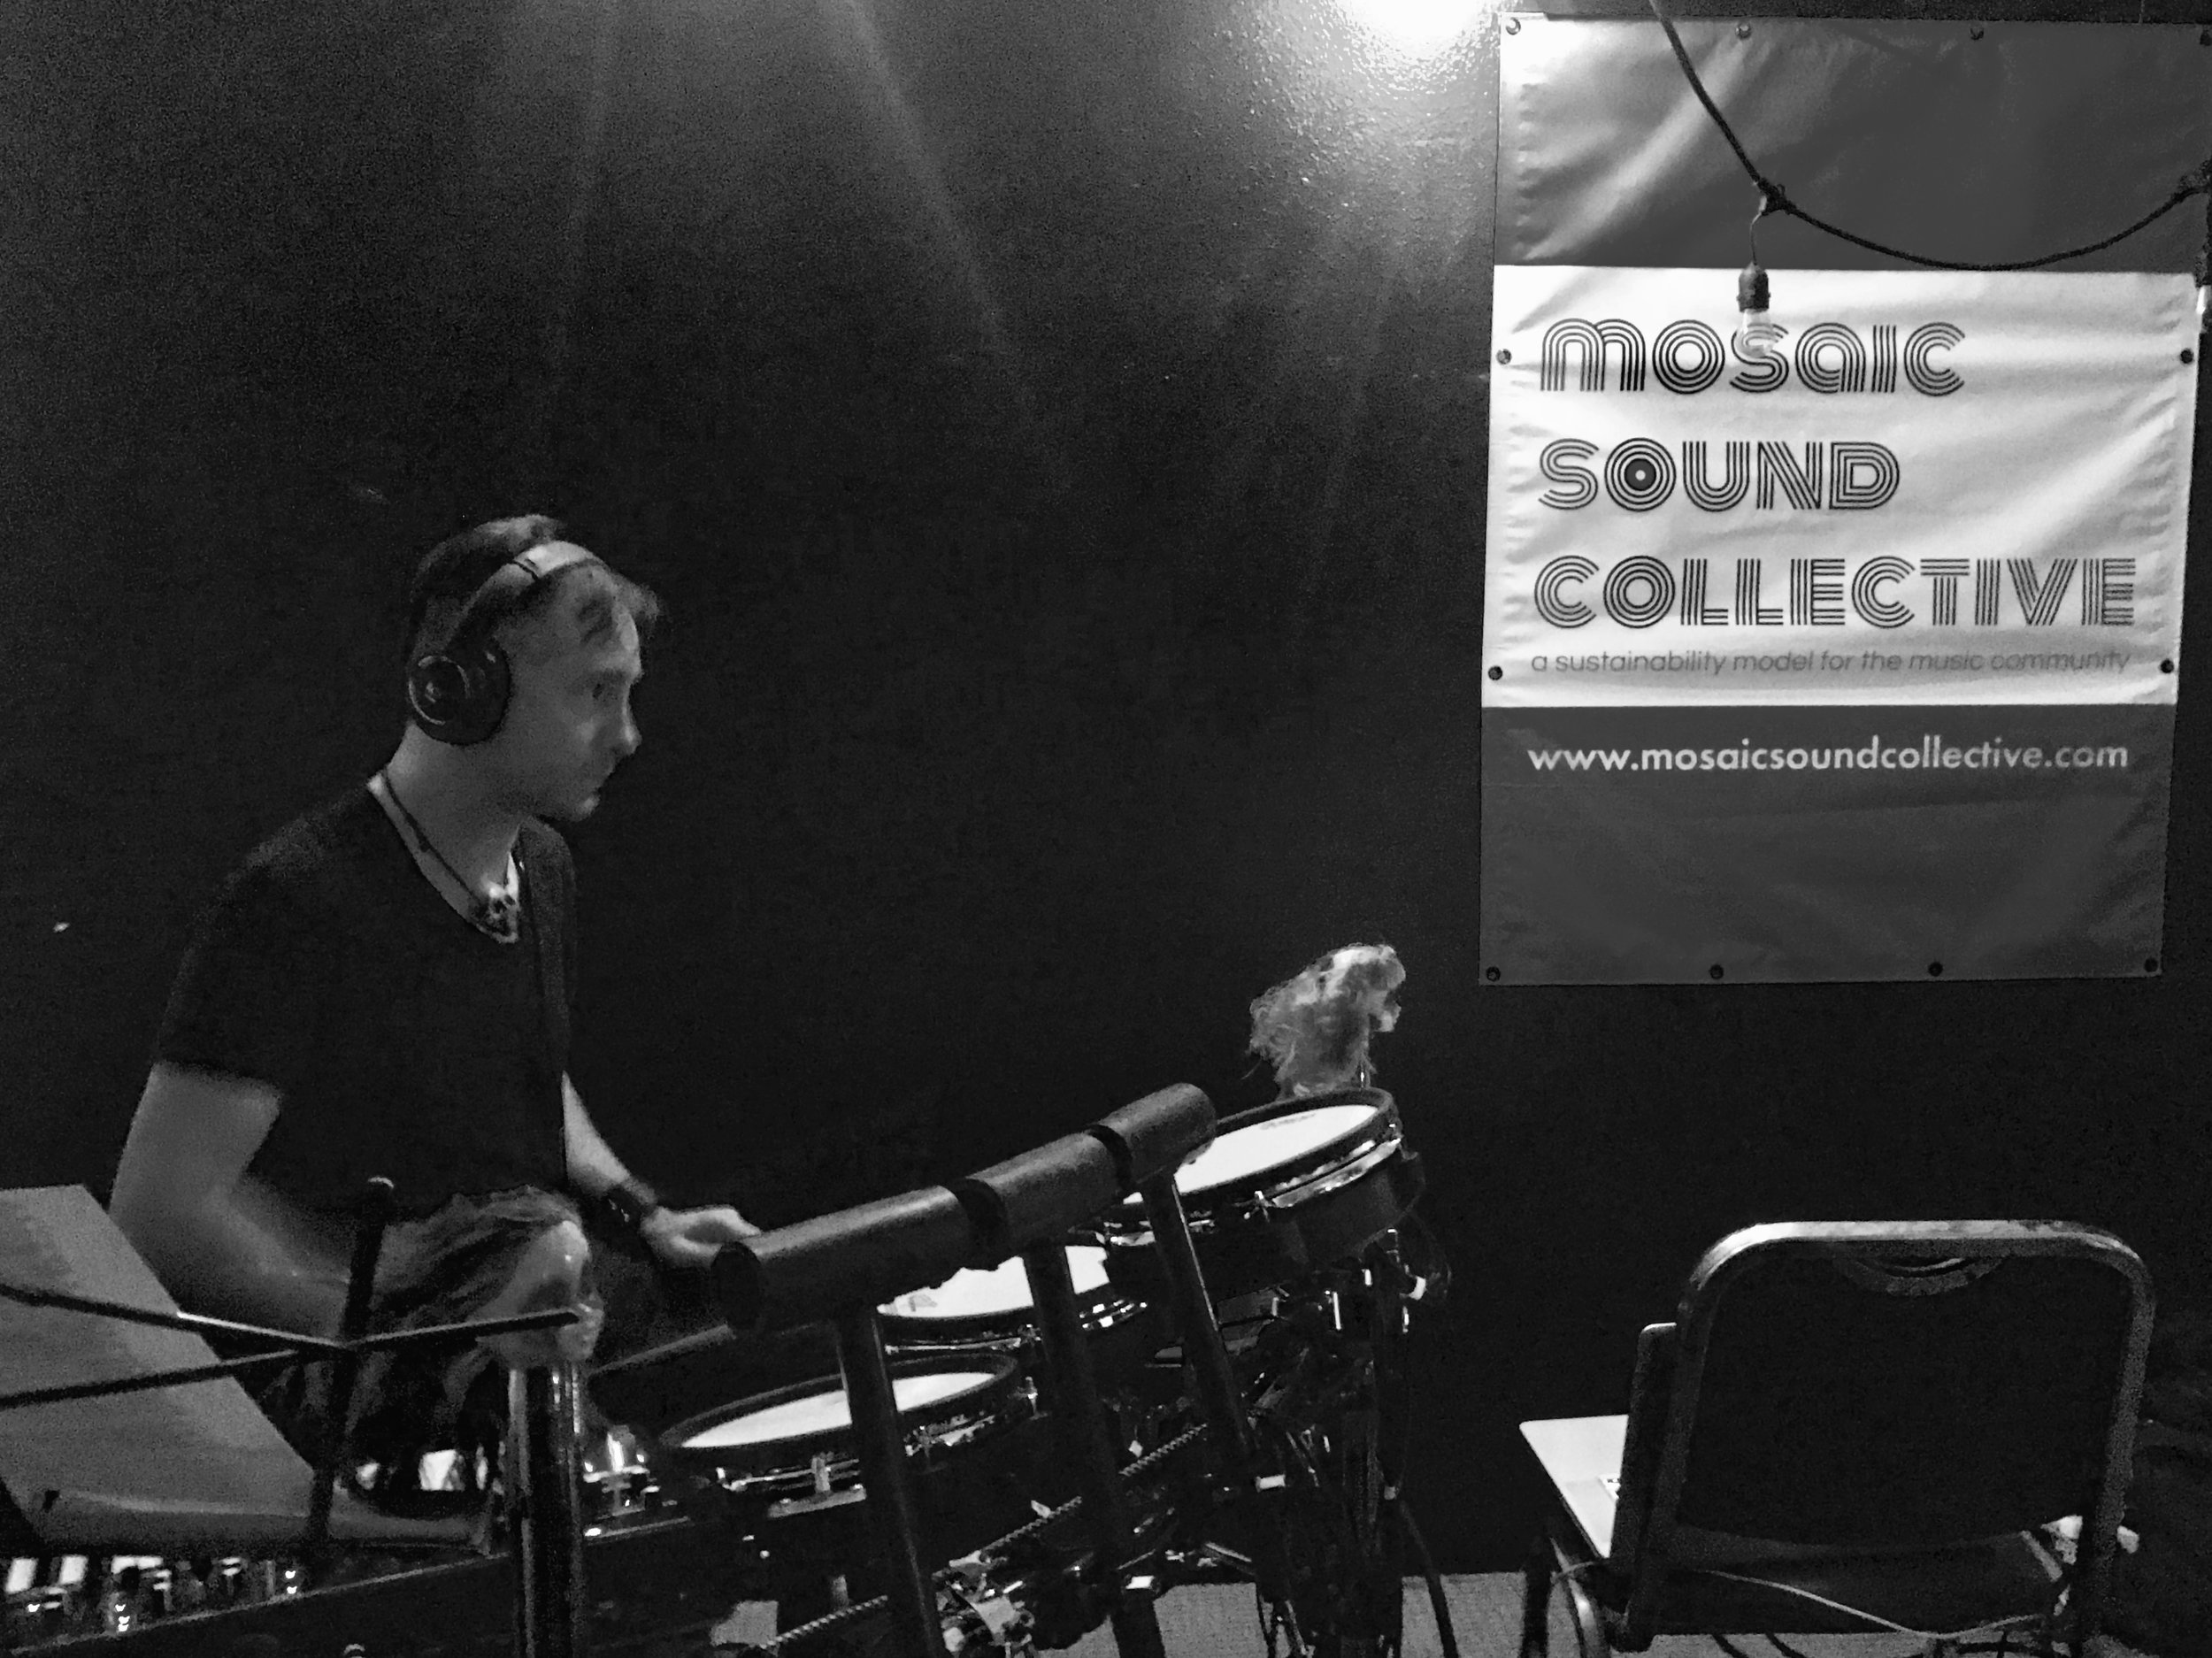 drummer bw.JPG